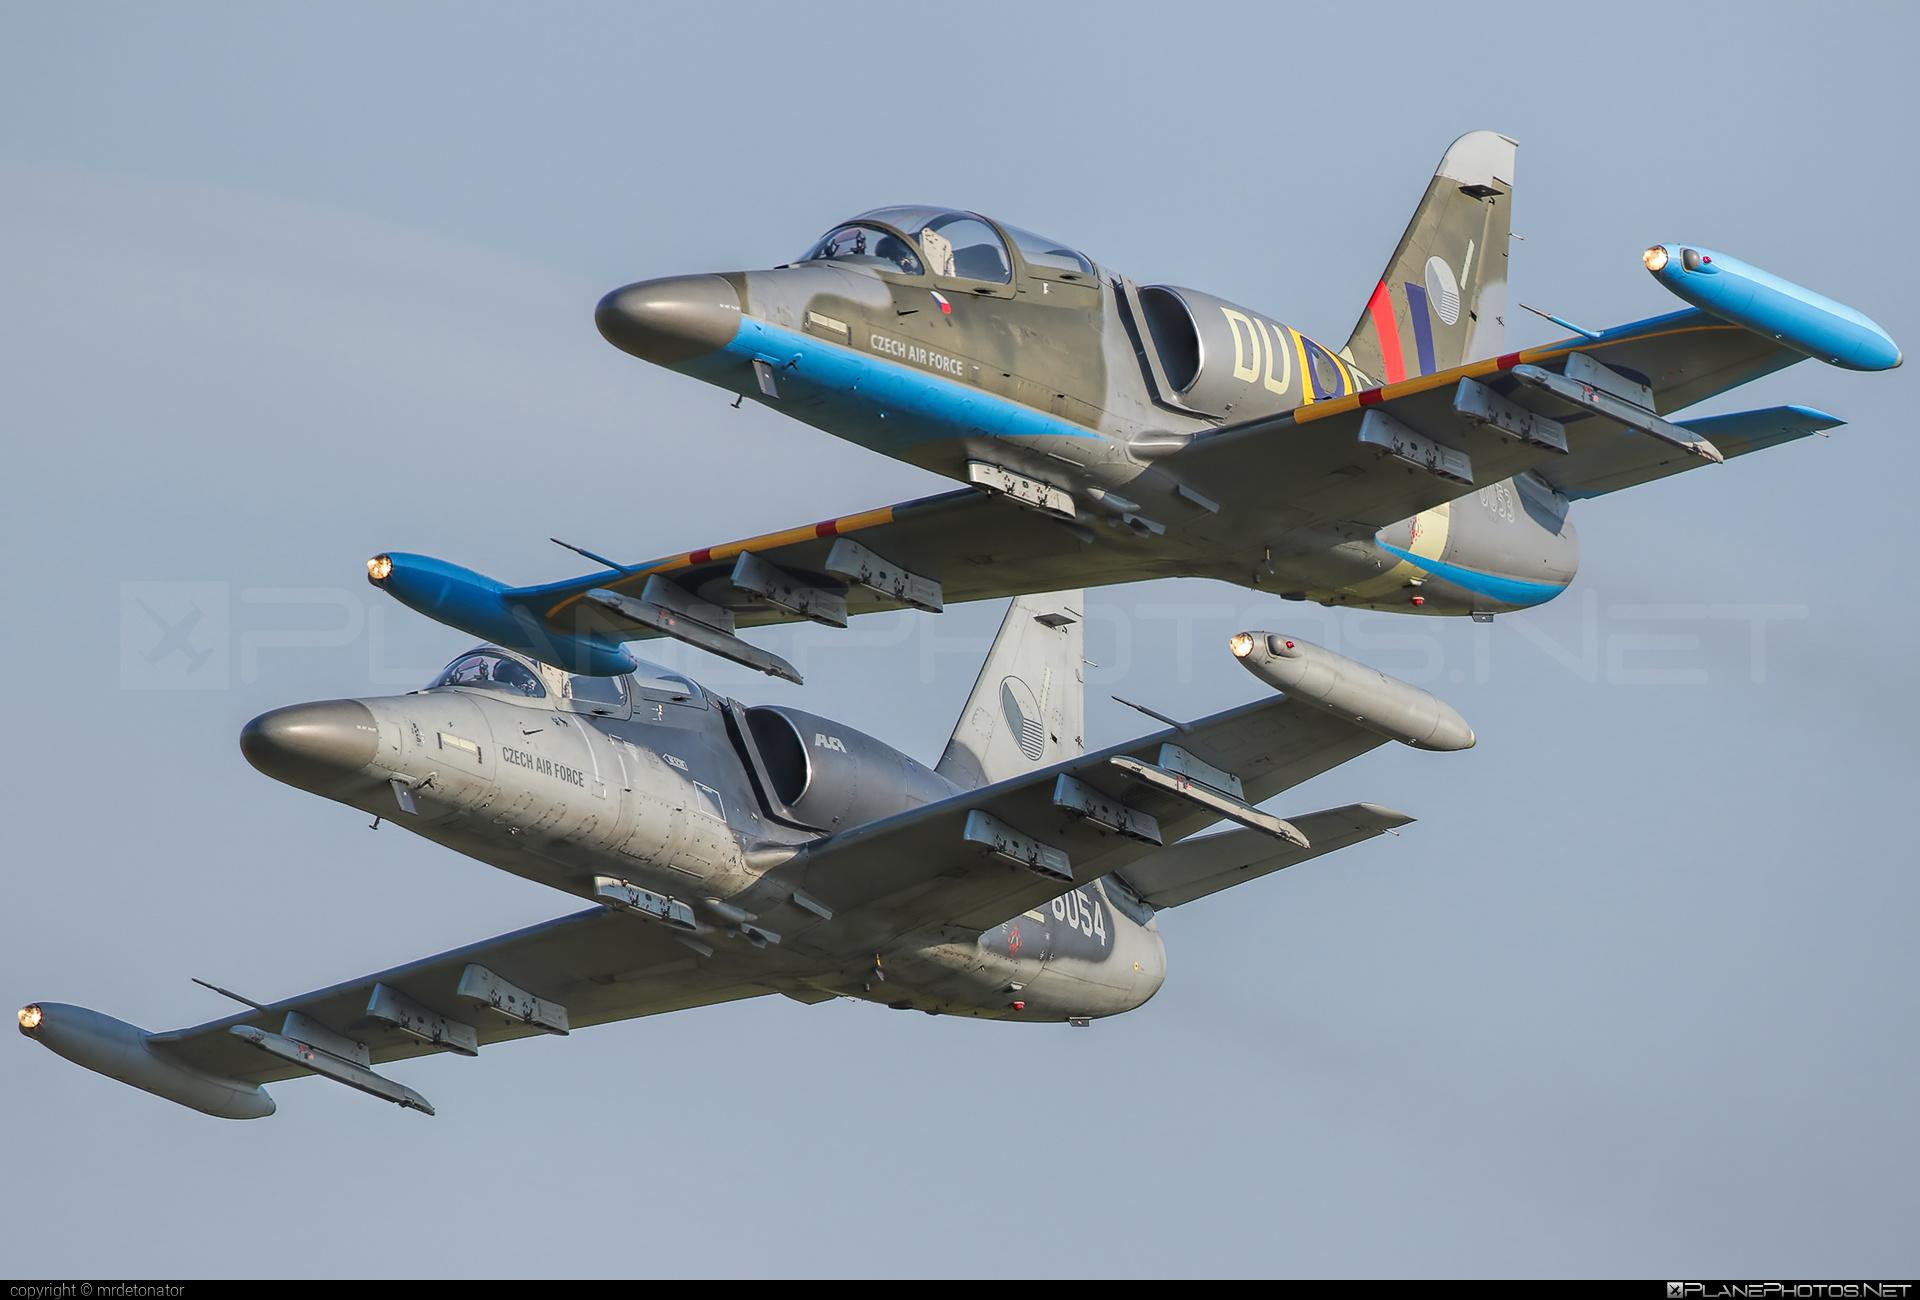 Aero L-159A Alca - 6053 operated by Vzdušné síly AČR (Czech Air Force) #aero #aerol159 #aerol159aalca #aerol159alca #czechairforce #l159 #l159a #l159aalca #l159alca #vzdusnesilyacr